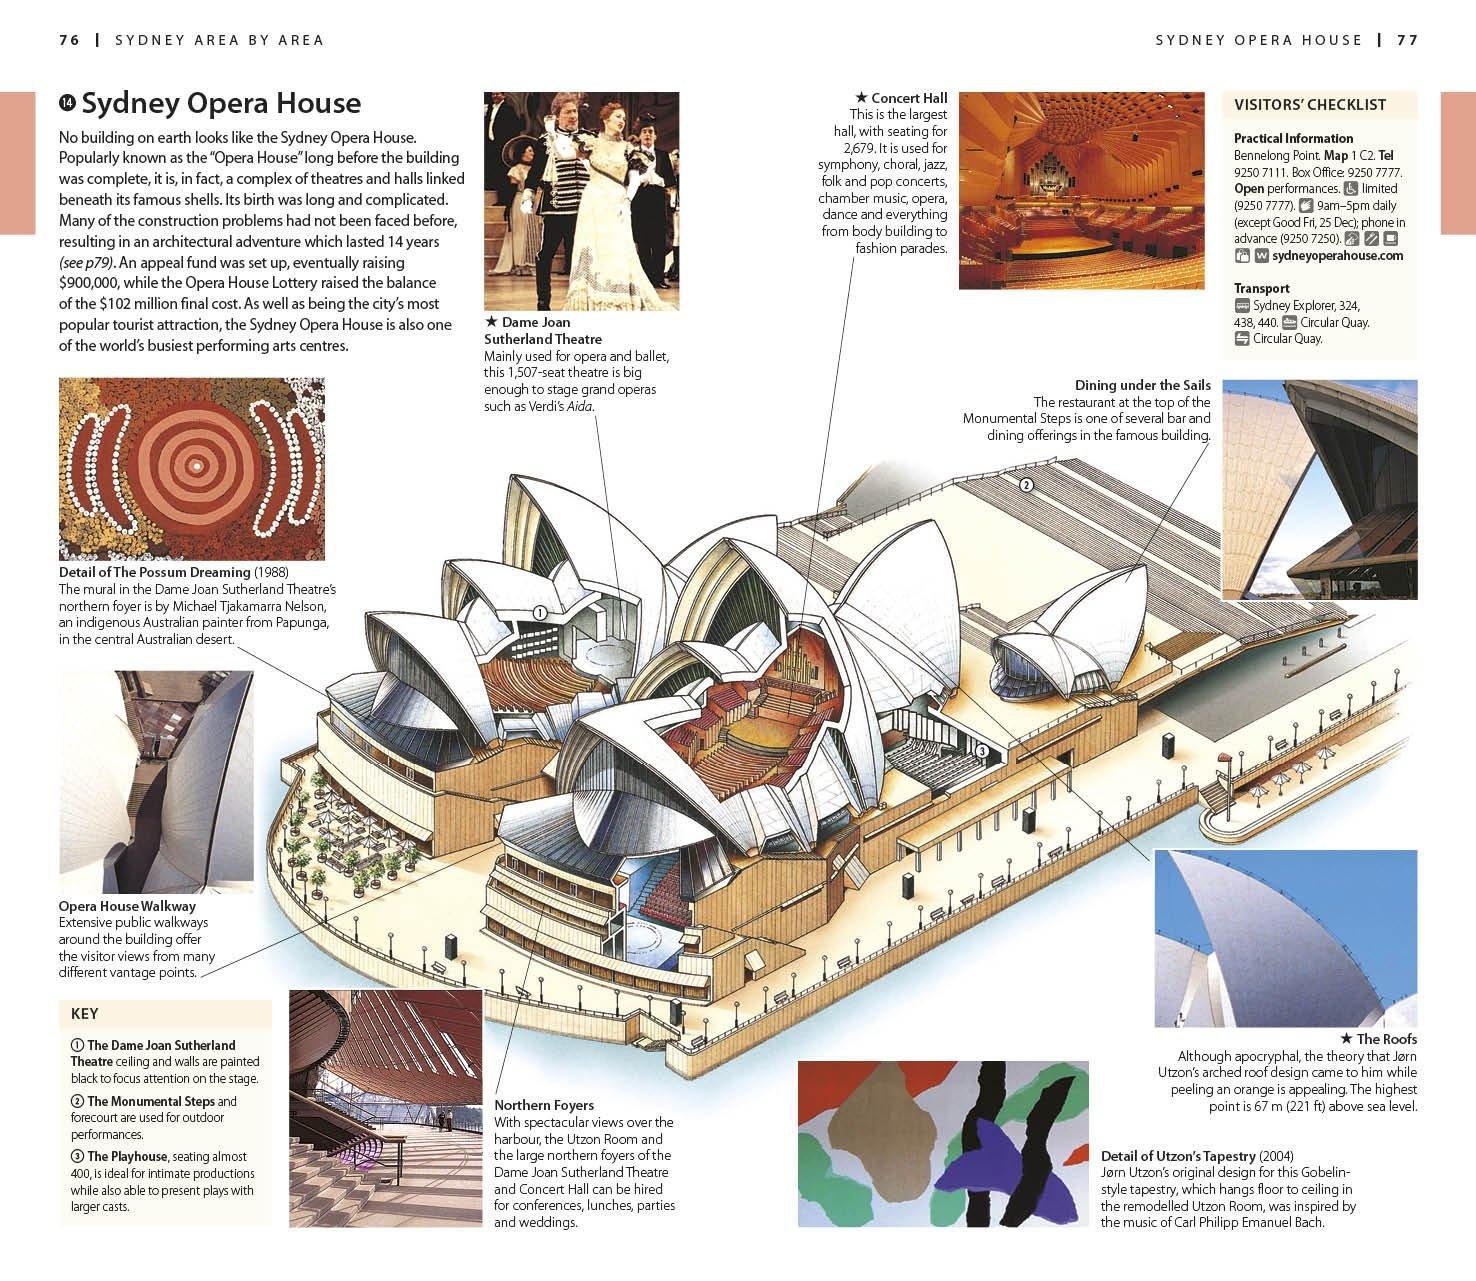 DK Eyewitness Travel Guide Sydney - 81ydinHEJaL - Getting Down Under